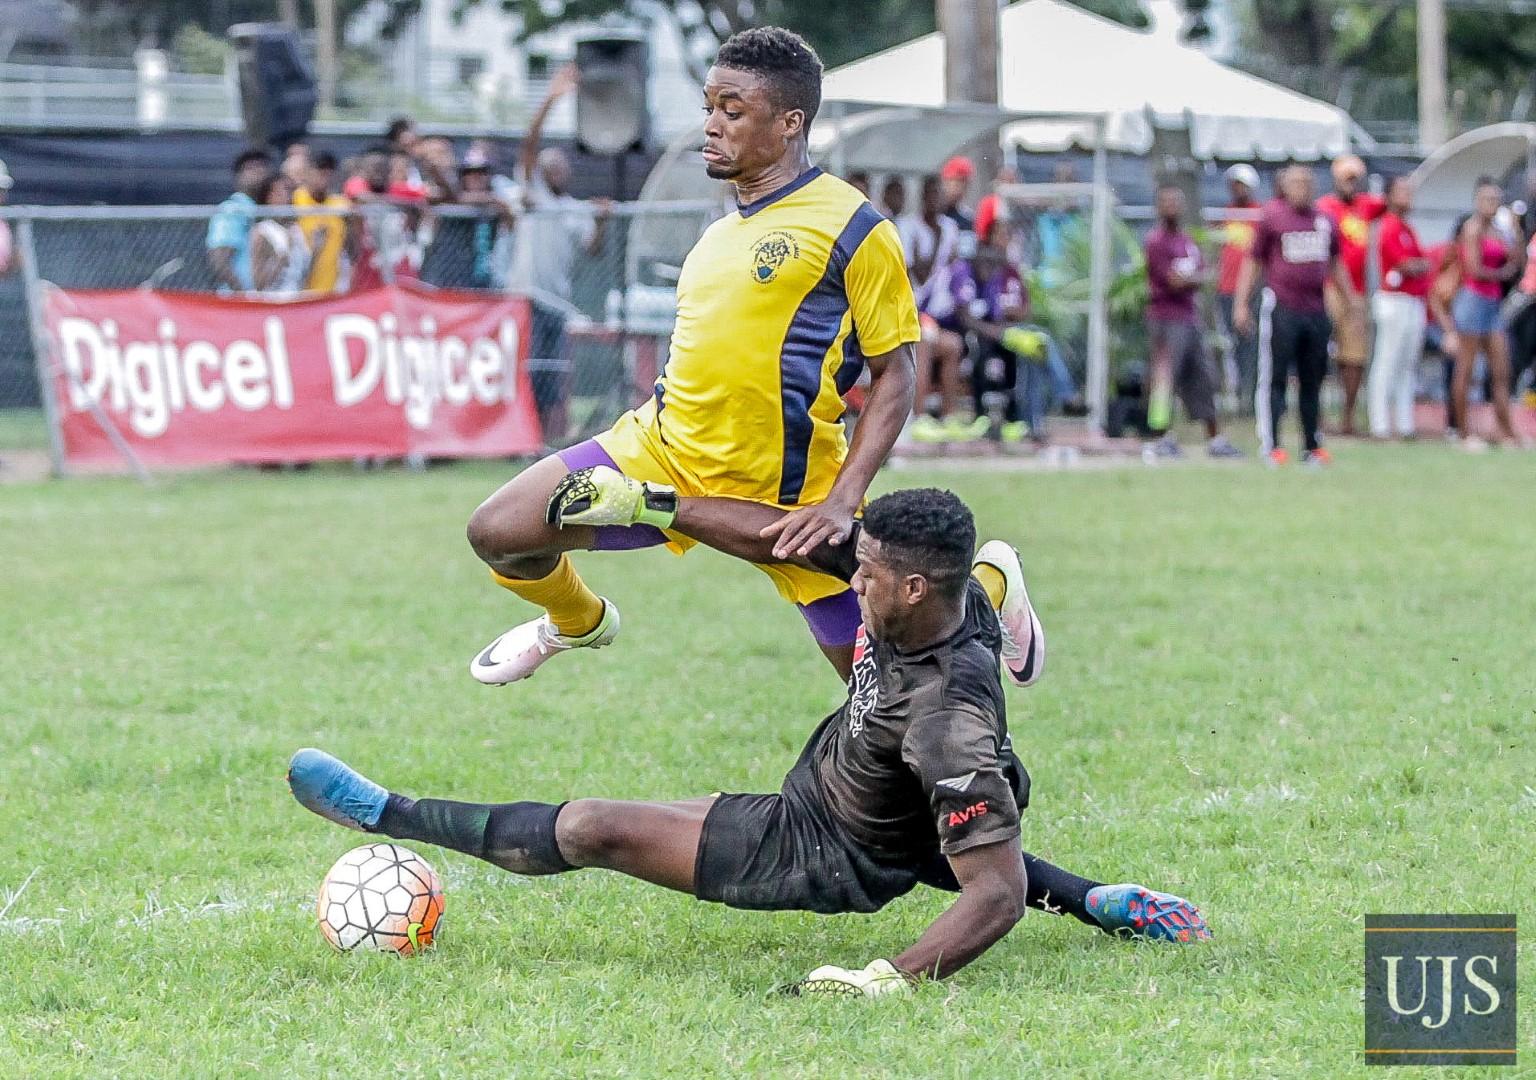 University of Technology, Ja forward player Dorvil Jackson skips away from UWI Mona custodian in an enticing football encounter at the UWI/UTech Games